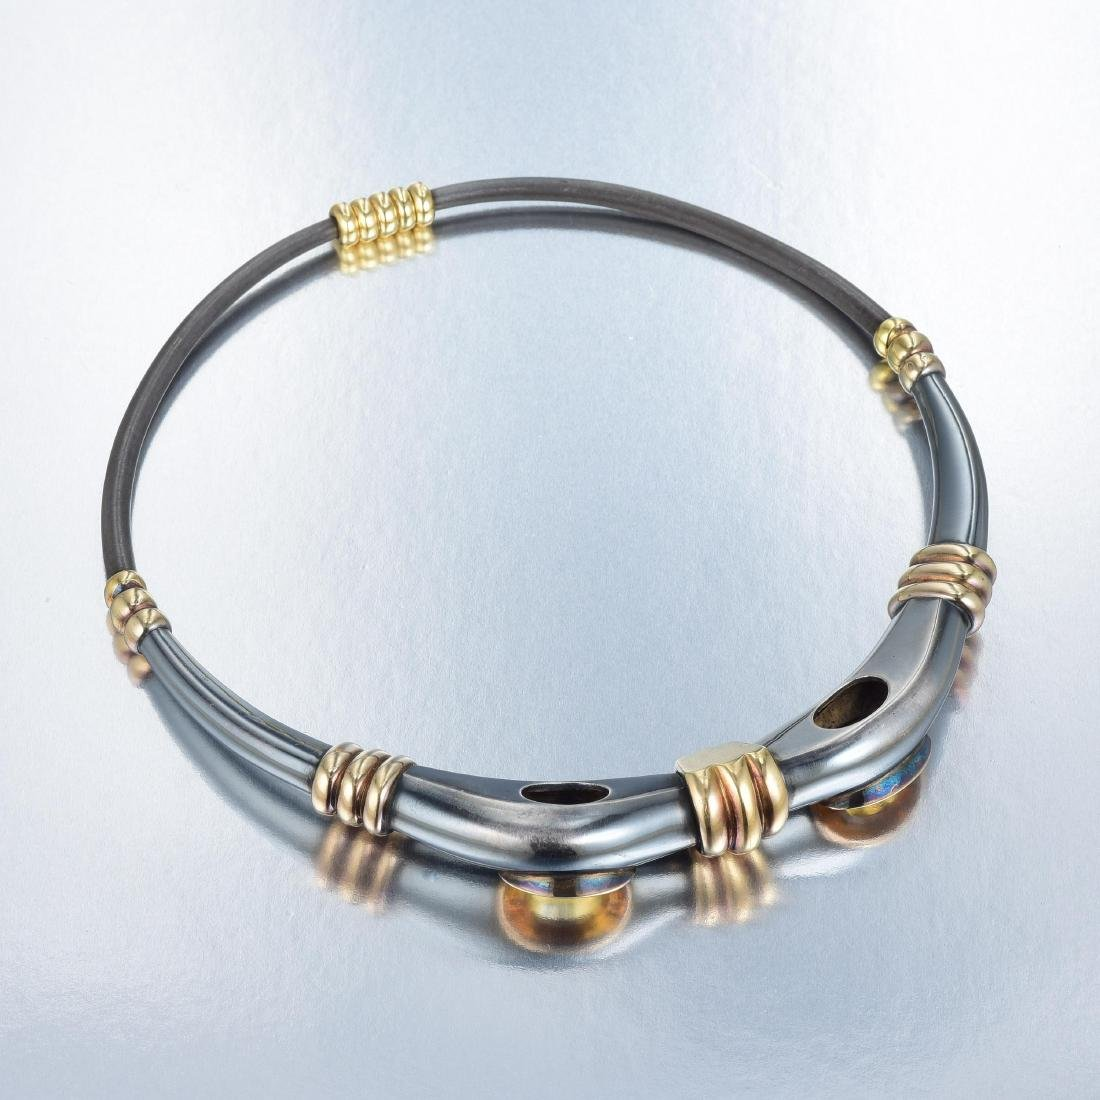 Rene Boivin Citrine Choker Necklace - 6